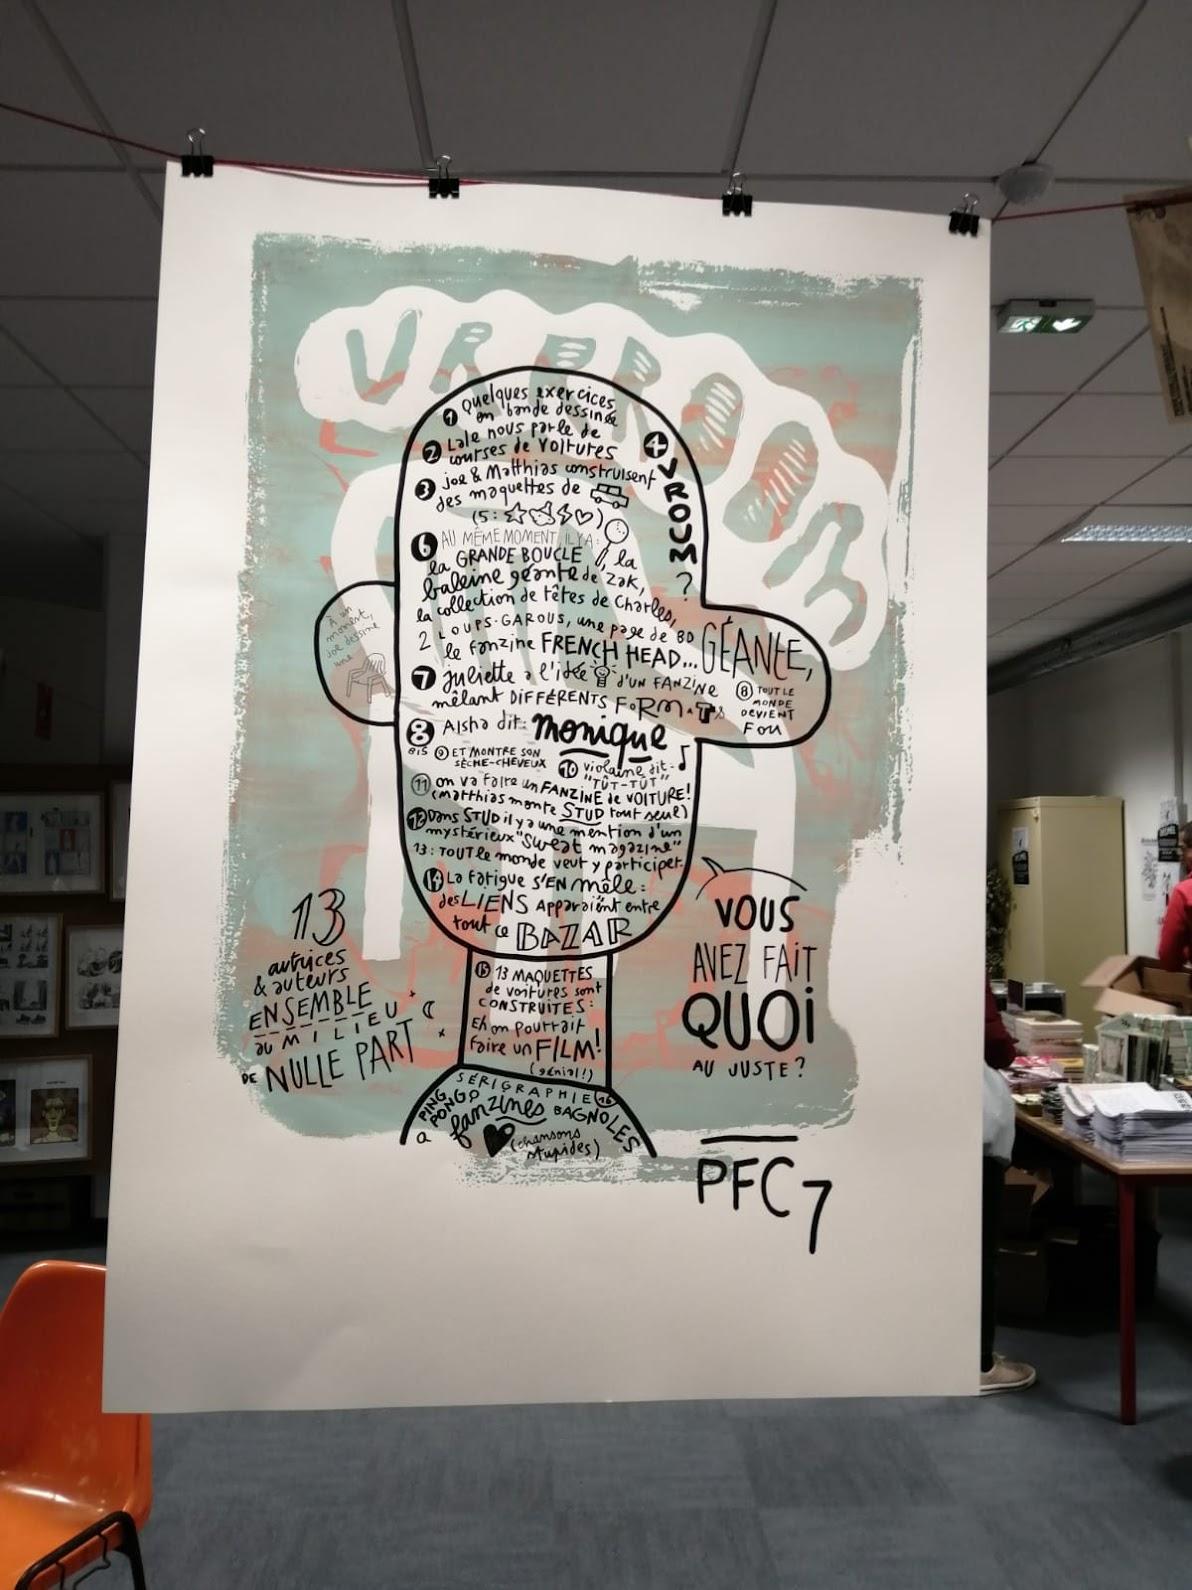 PFC#7 posters